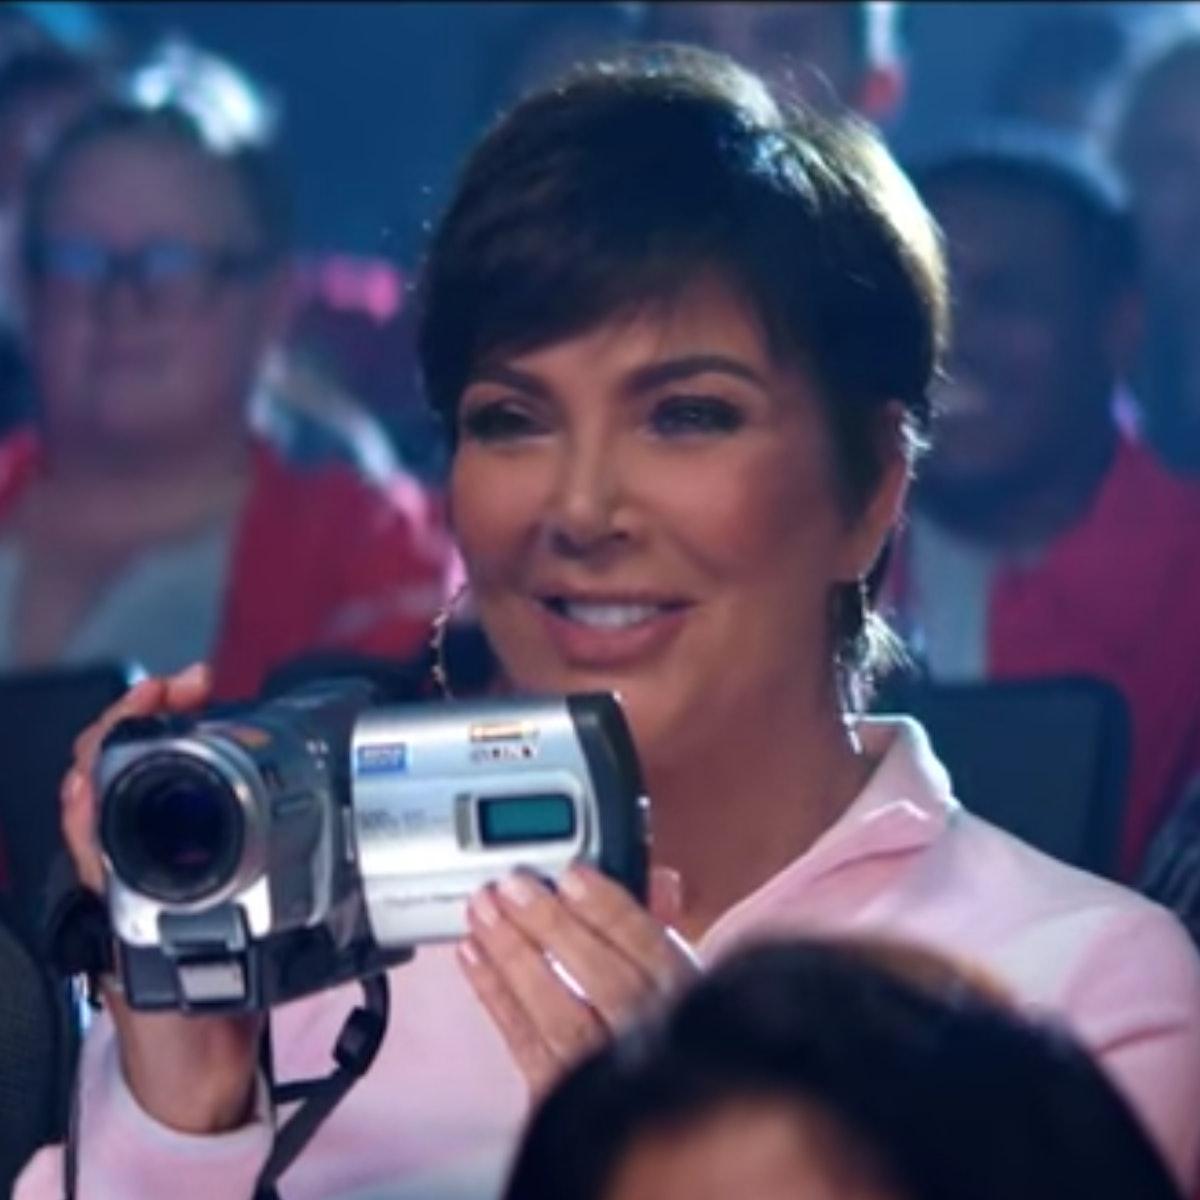 Kris Jenner in Thank U, Next